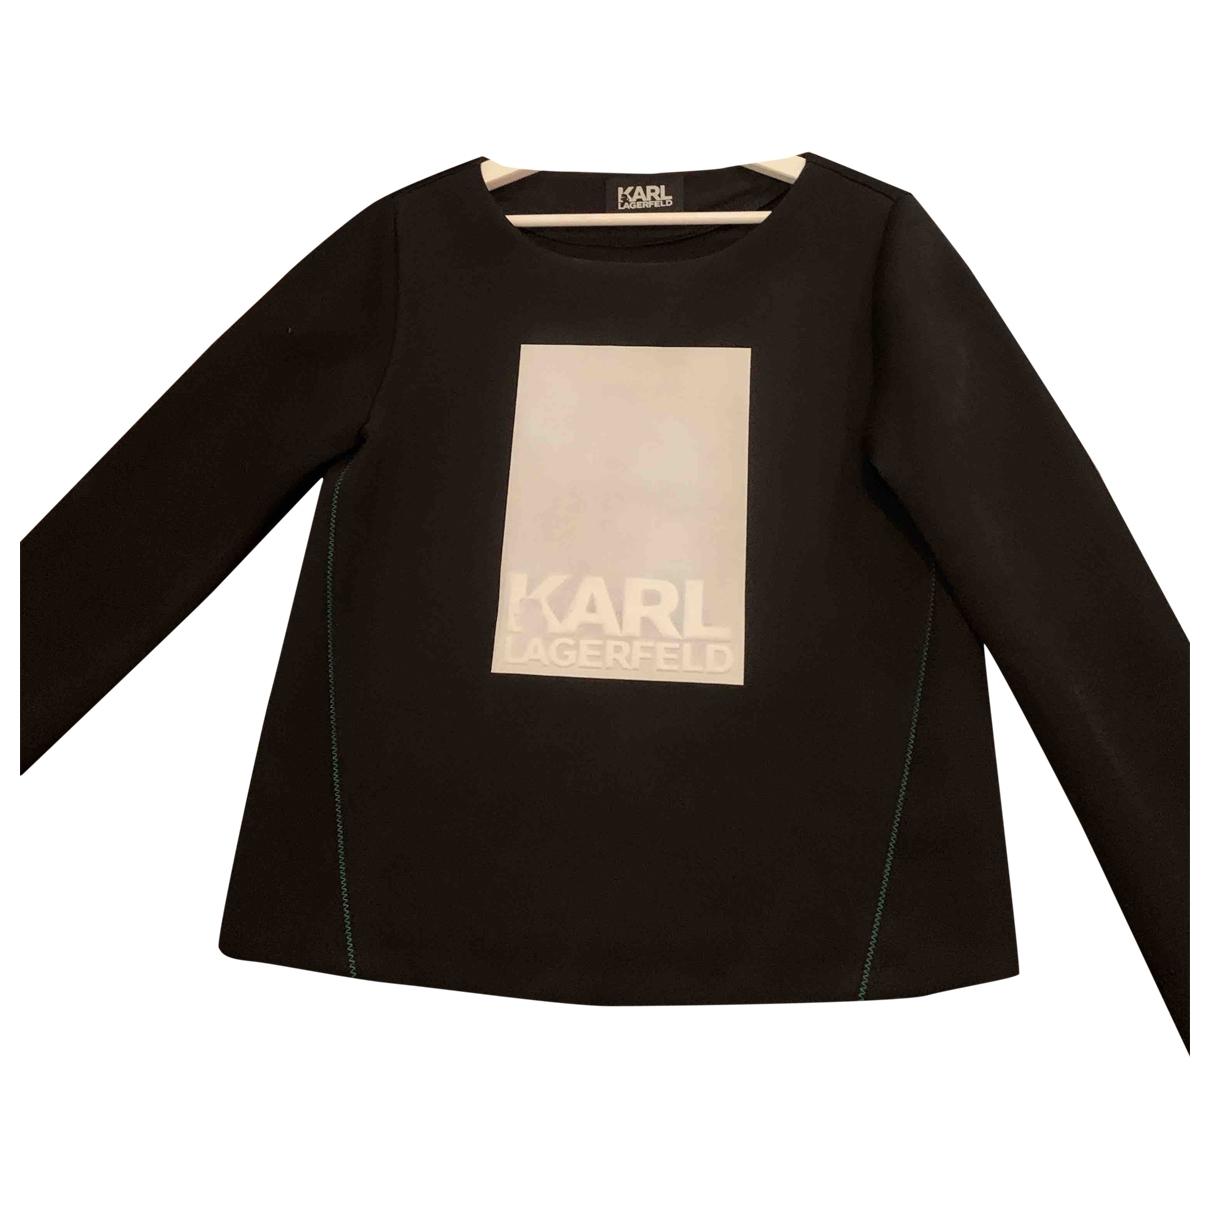 Karl \N Black  top for Women M International